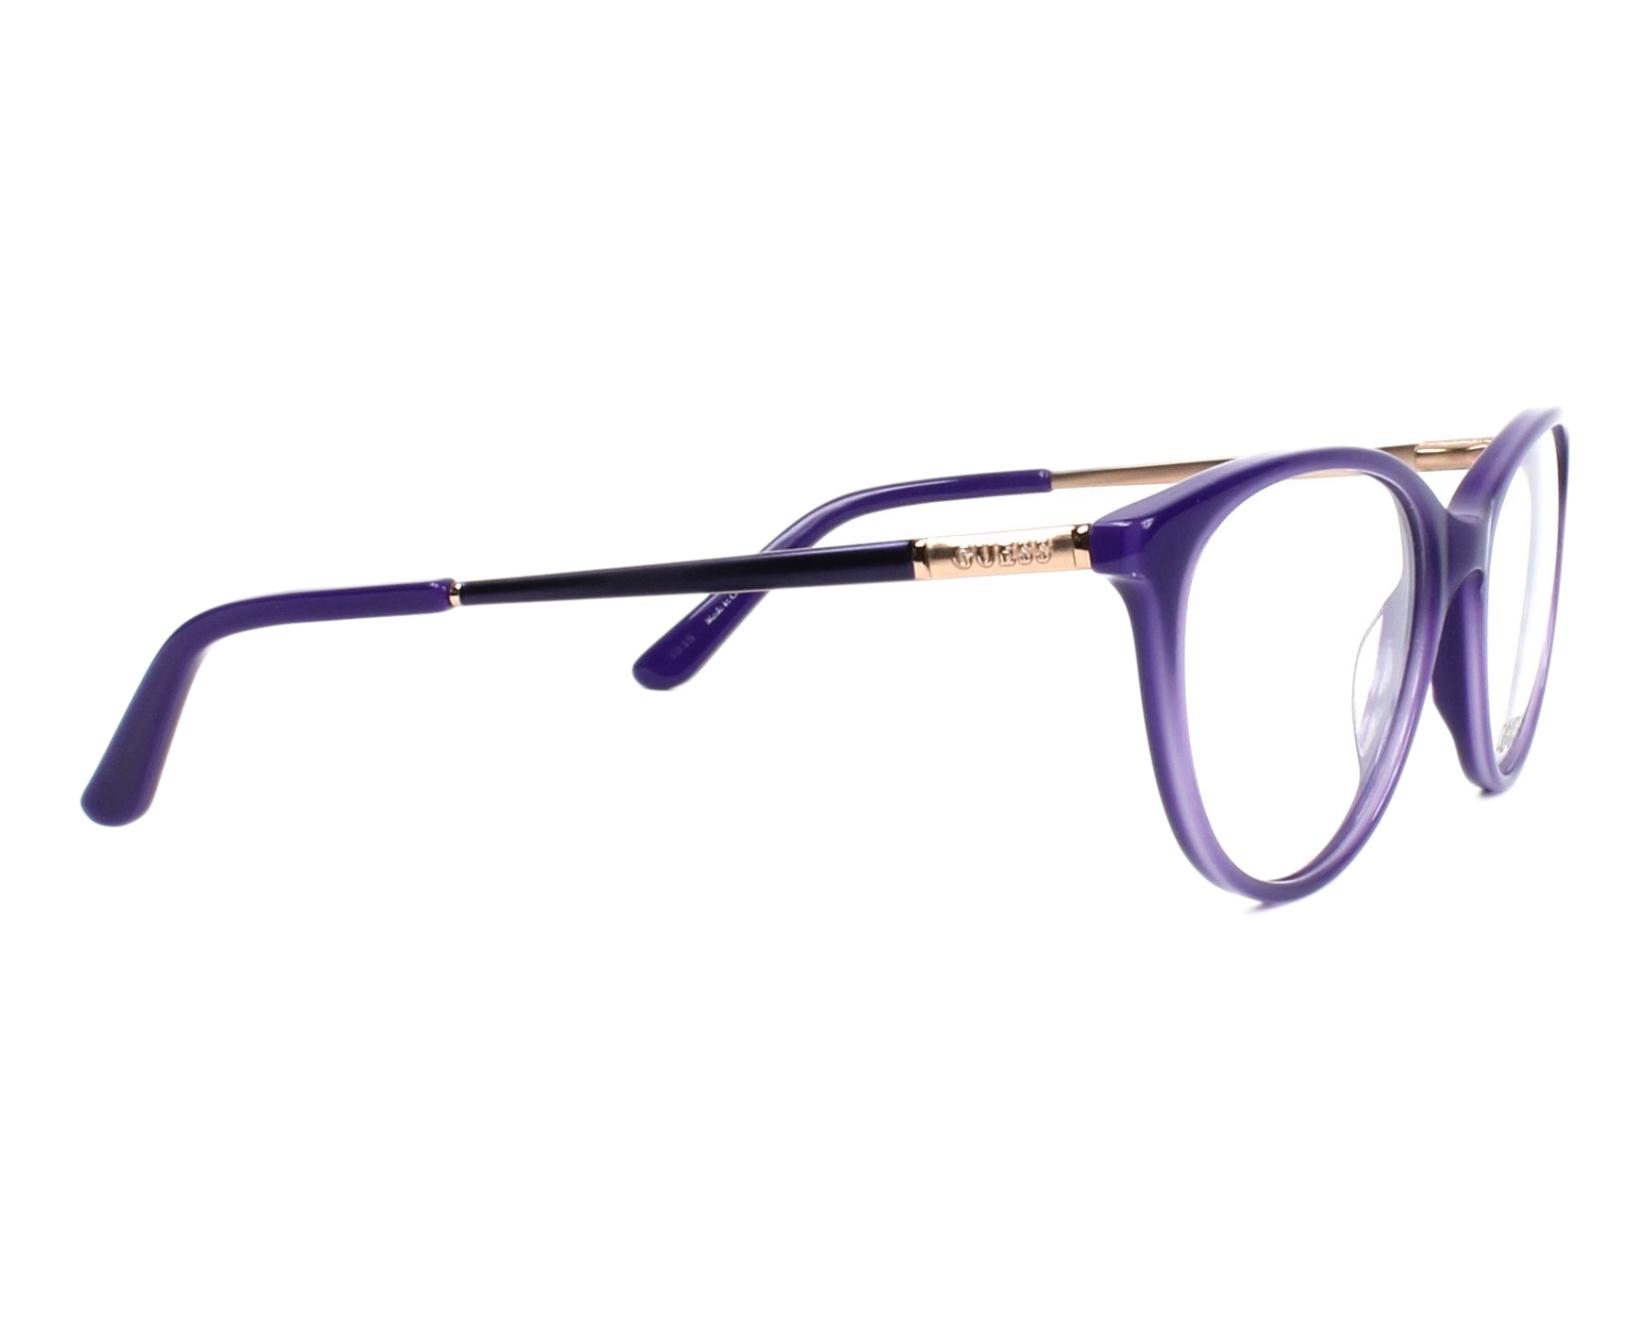 70cdef3c4ea eyeglasses Guess GU-2565 081 52-17 Purple Copper side view